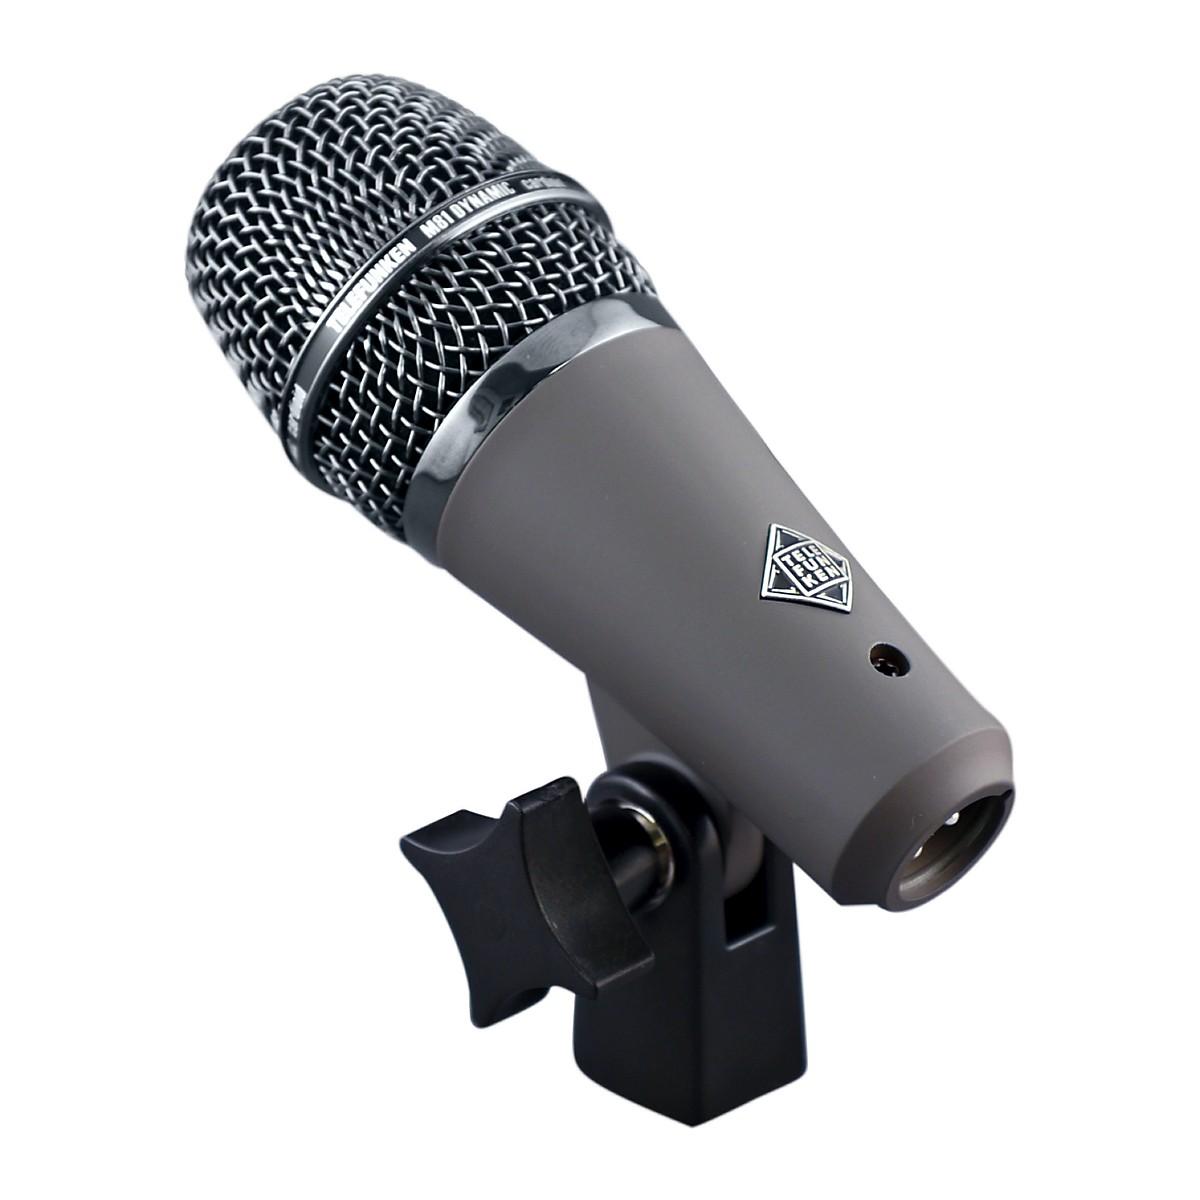 Telefunken M81-SH Dynamic Microphone